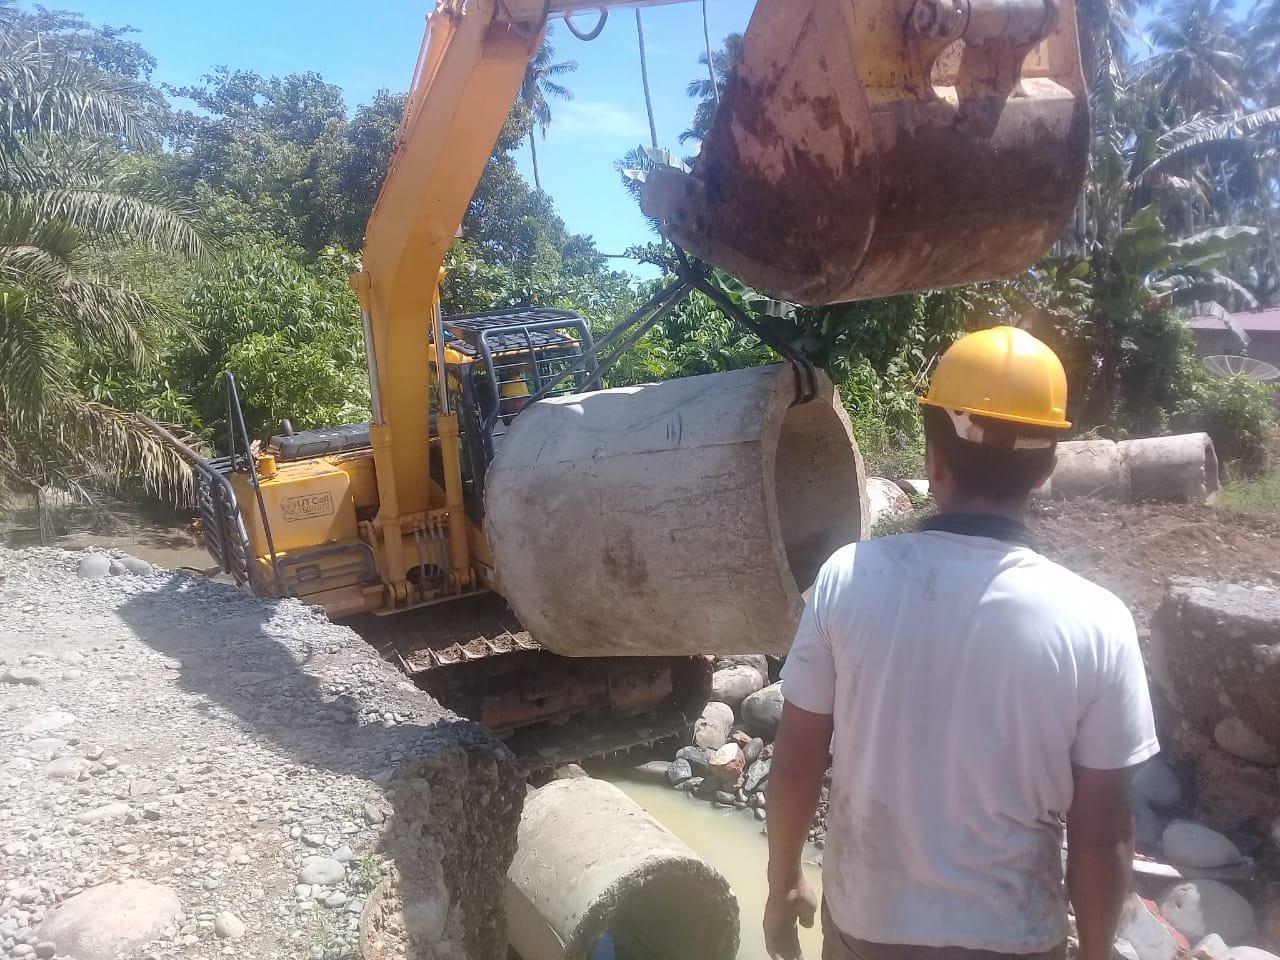 Bupati Turunkan Alat Berat dan Kirim Logistik untuk Korban Banjir Natal